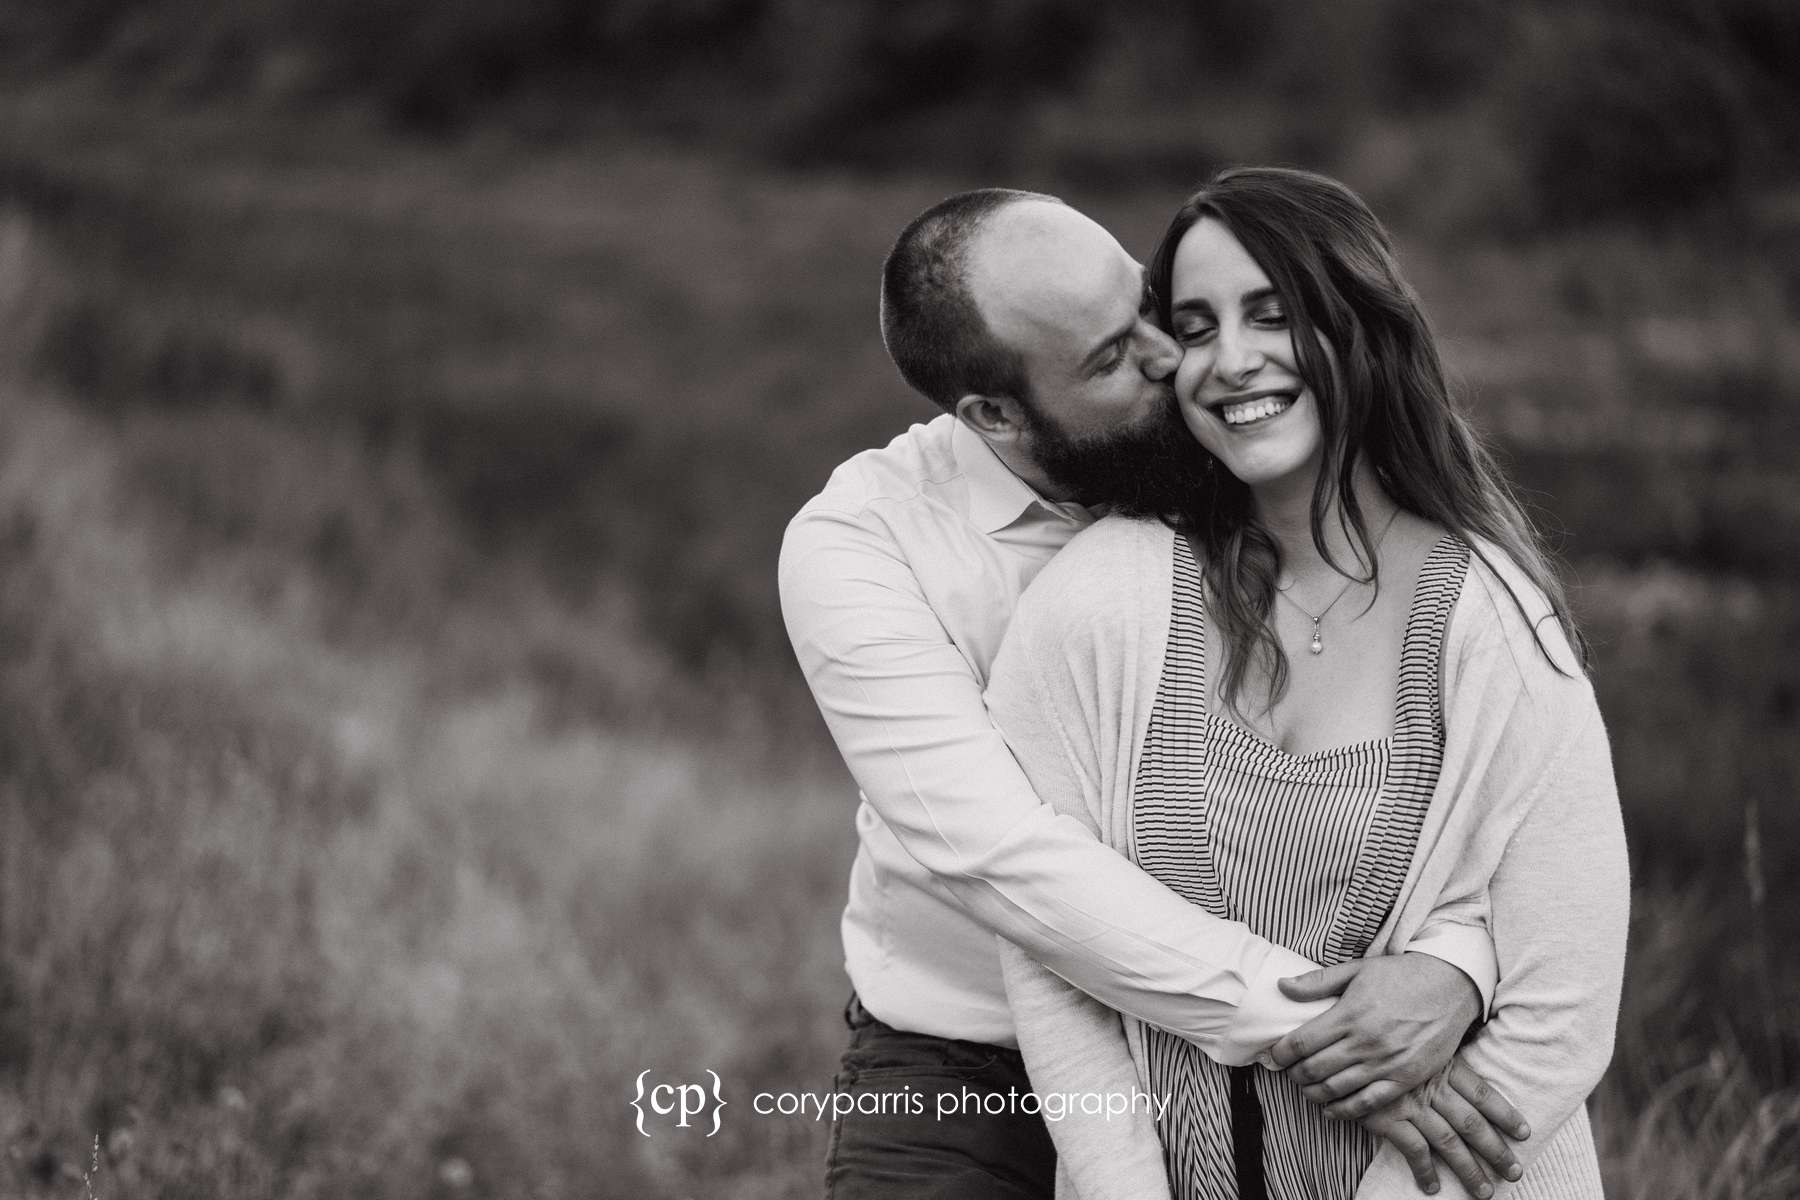 040-Engagement-Portraits-Marrymoor-Park.jpg